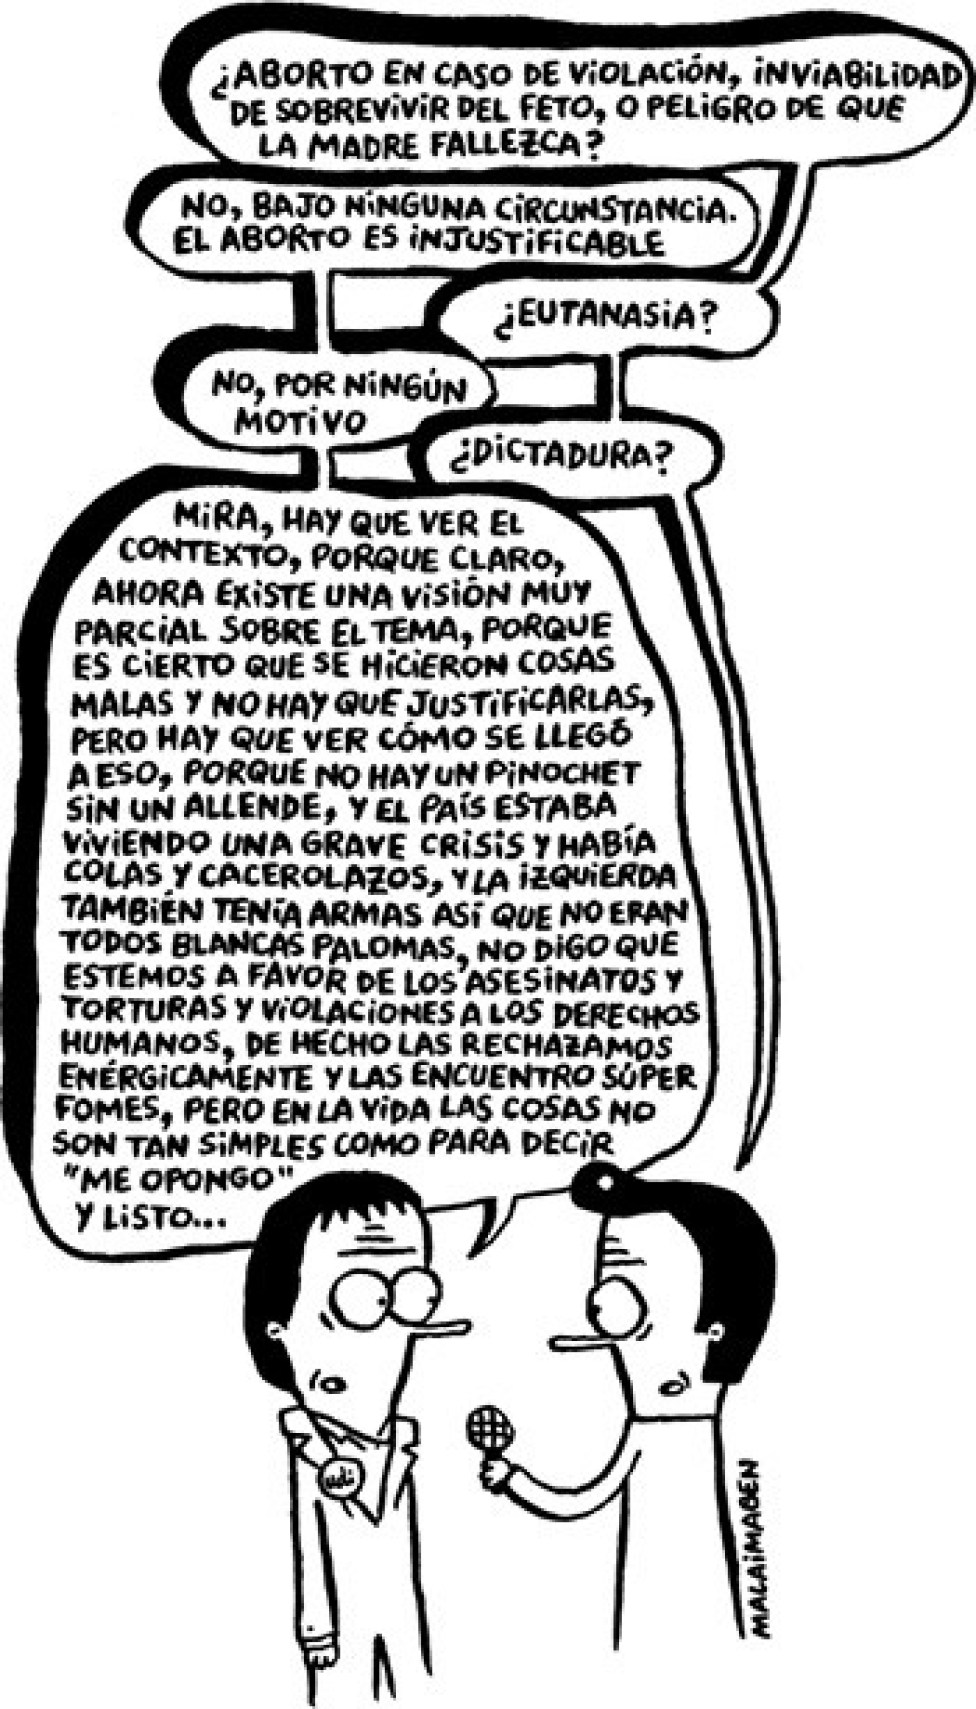 malaimagen-aborto-eutanasia-dictadura-contexto